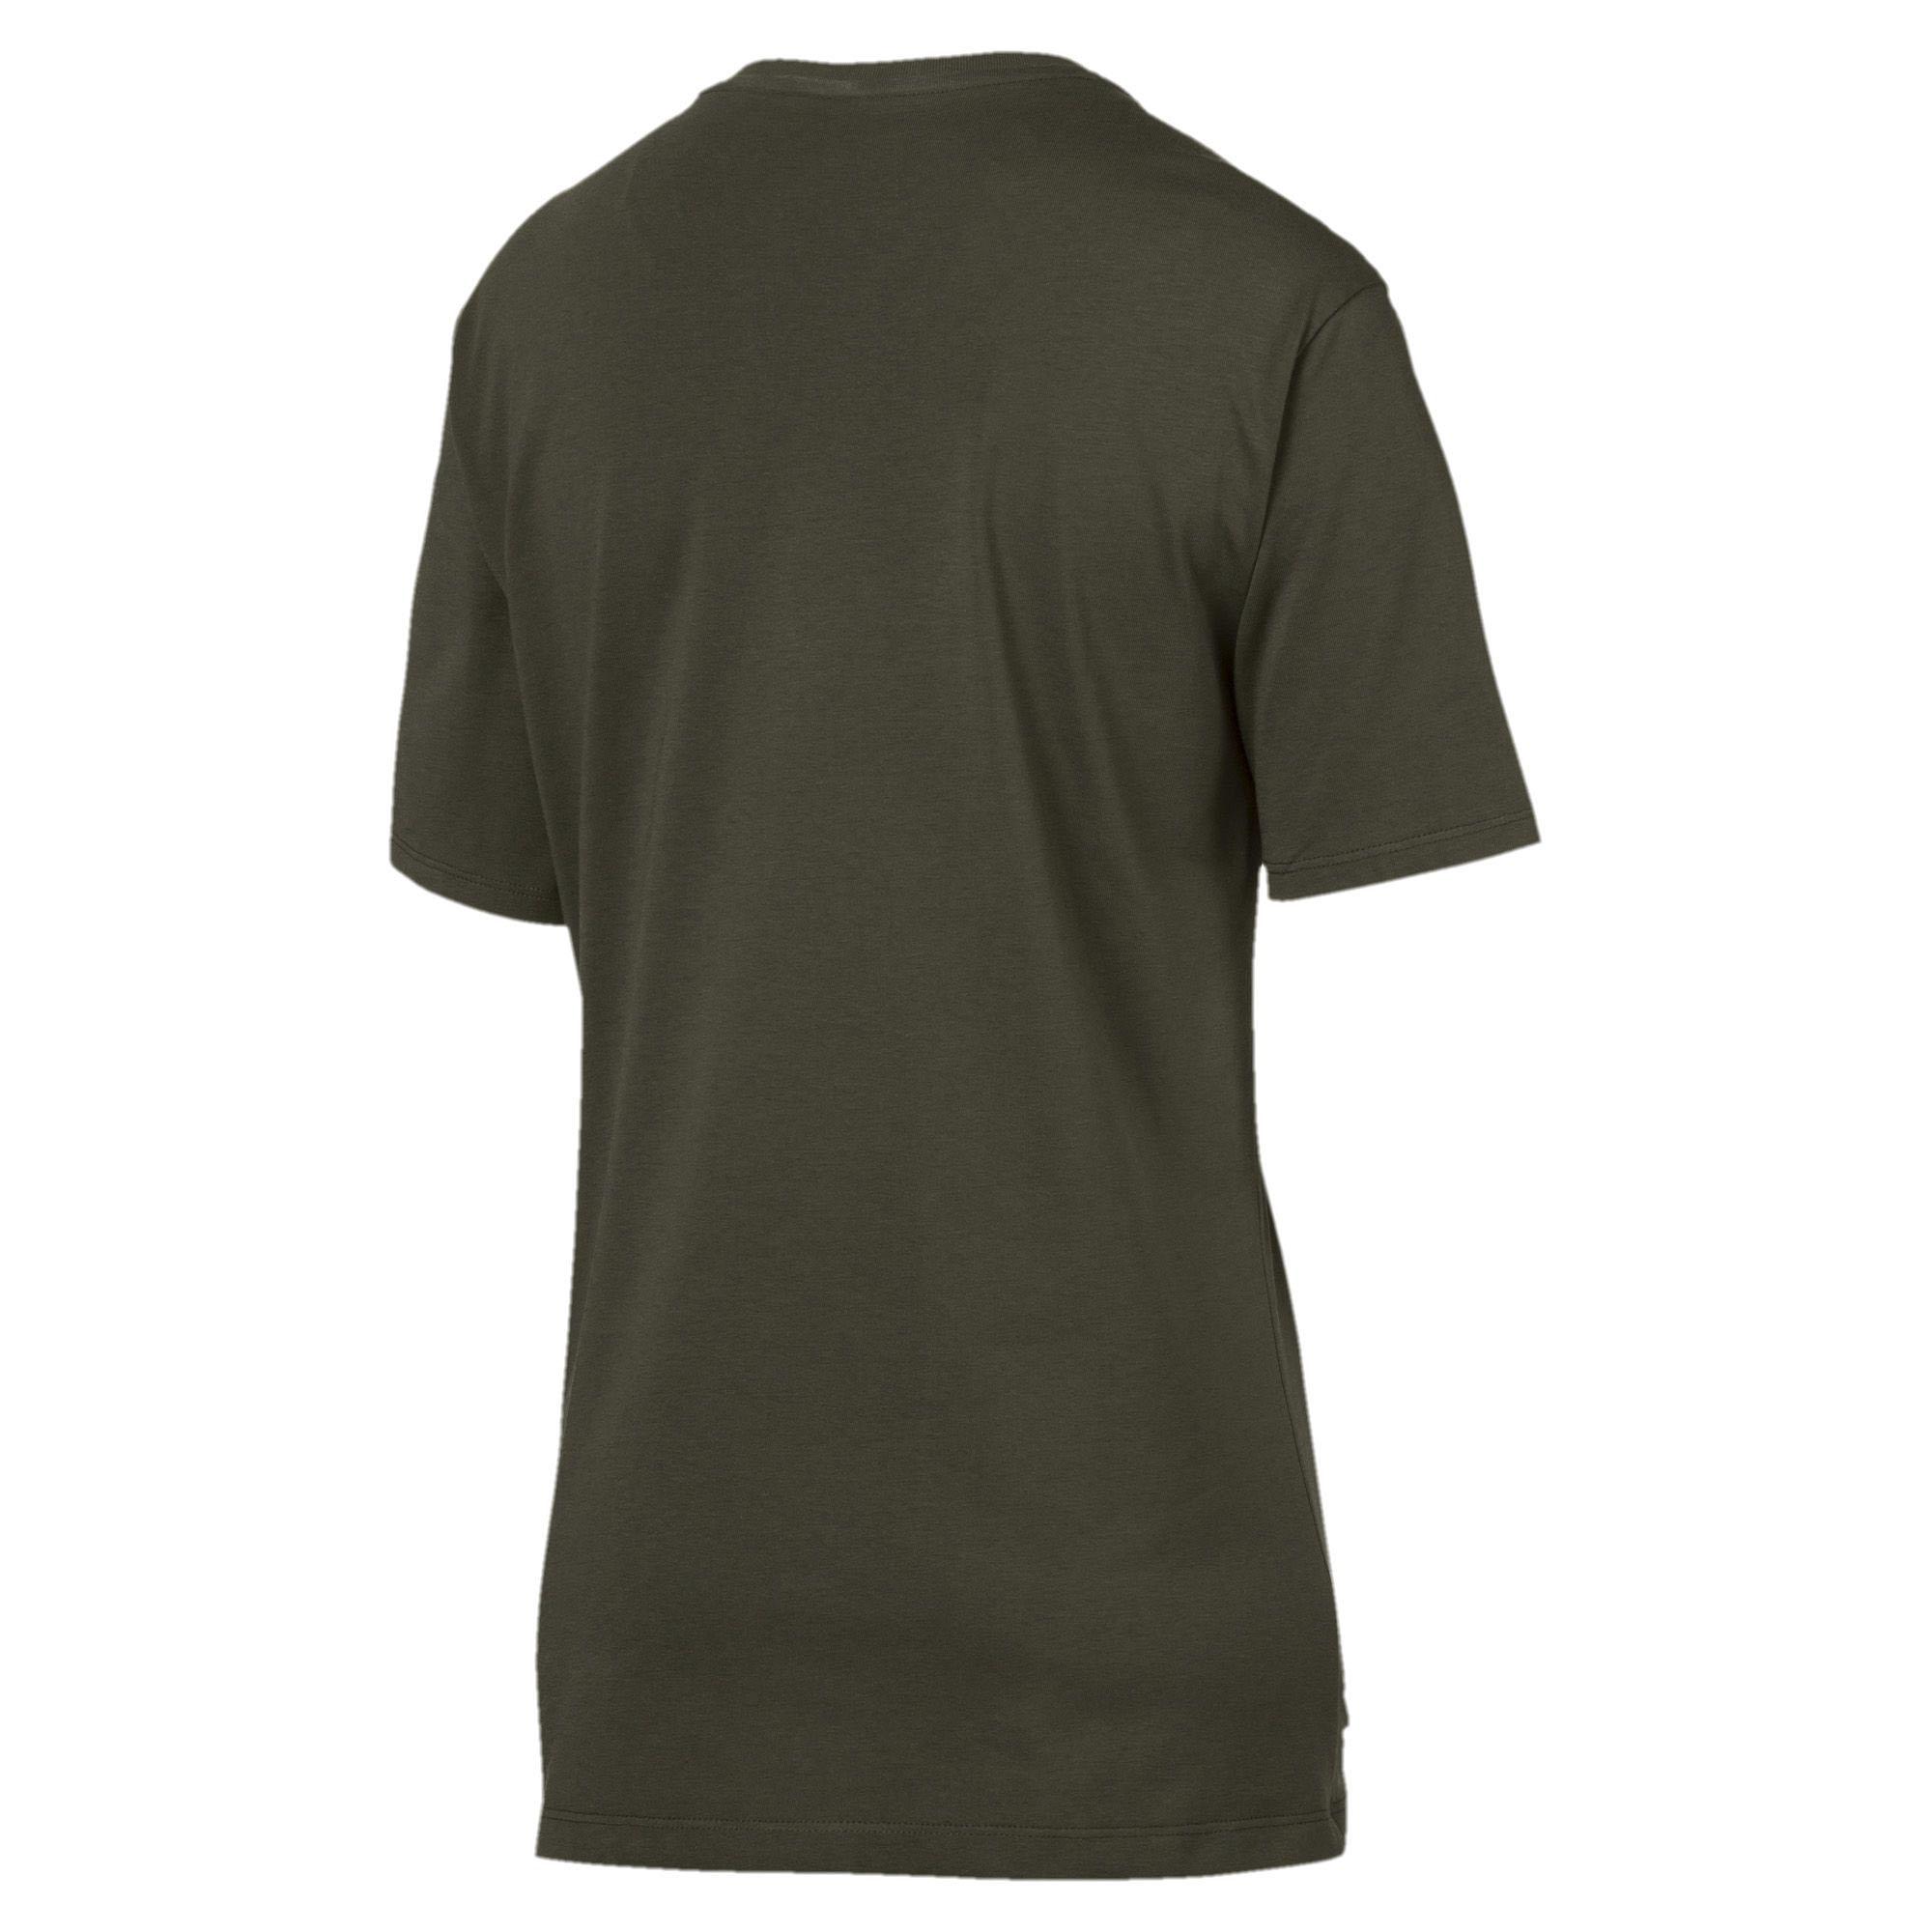 Logo Womens Ladies Sports Fashion Boyfriend T-shirt Tee Puma Essential Clothing & Accessories